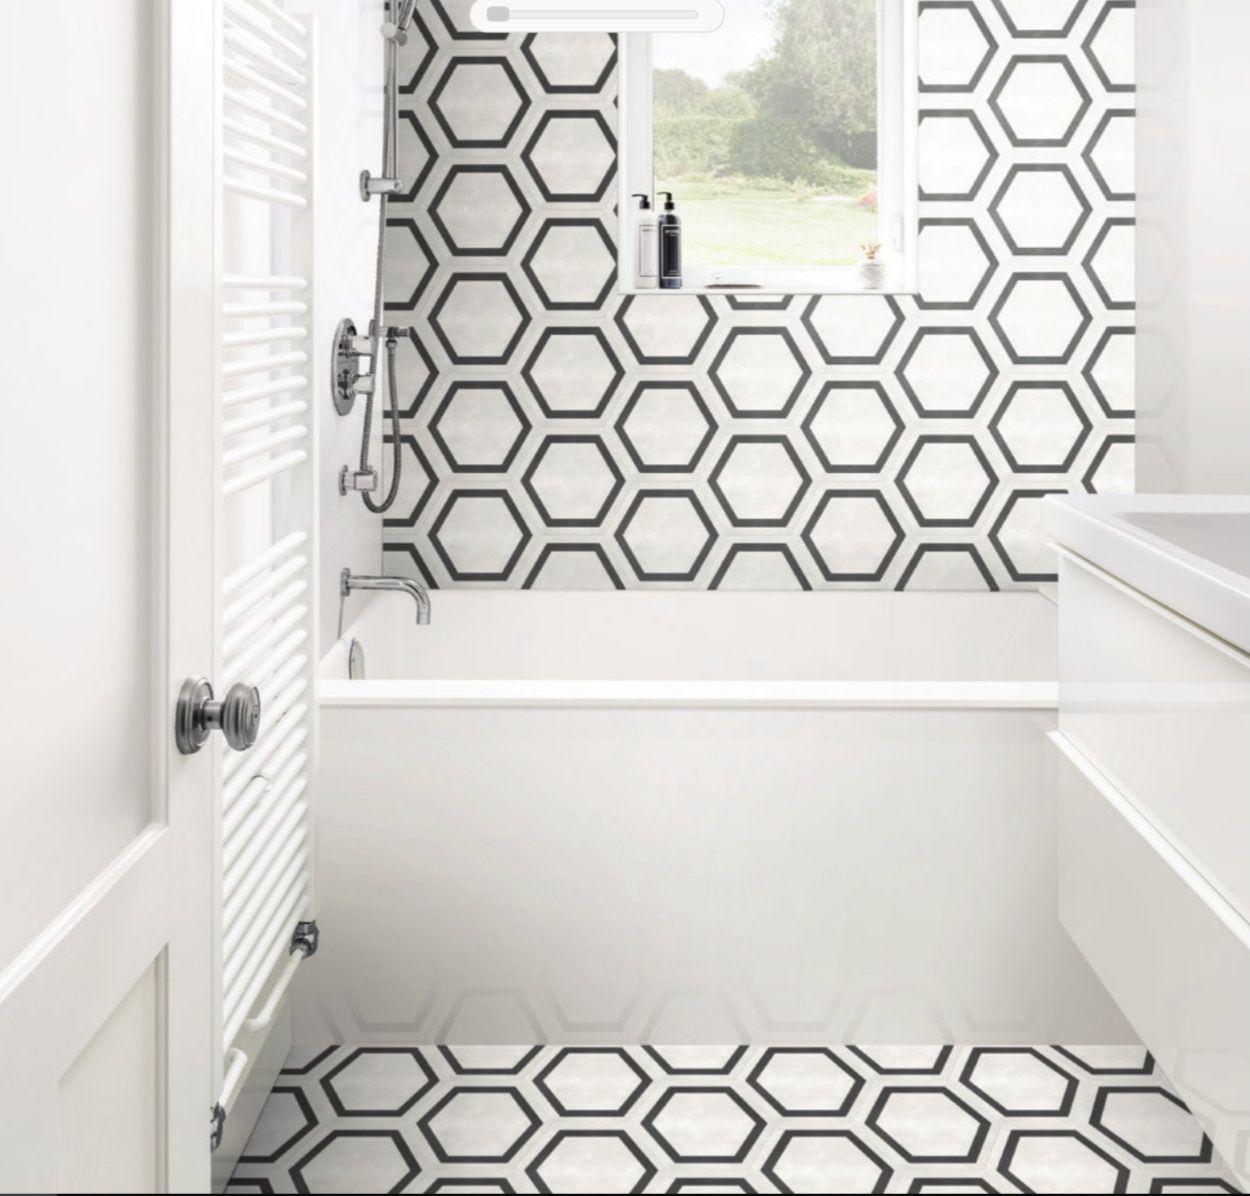 Form 8 X 7 Framed Hexagon Ivory Matte Finish Porcelain